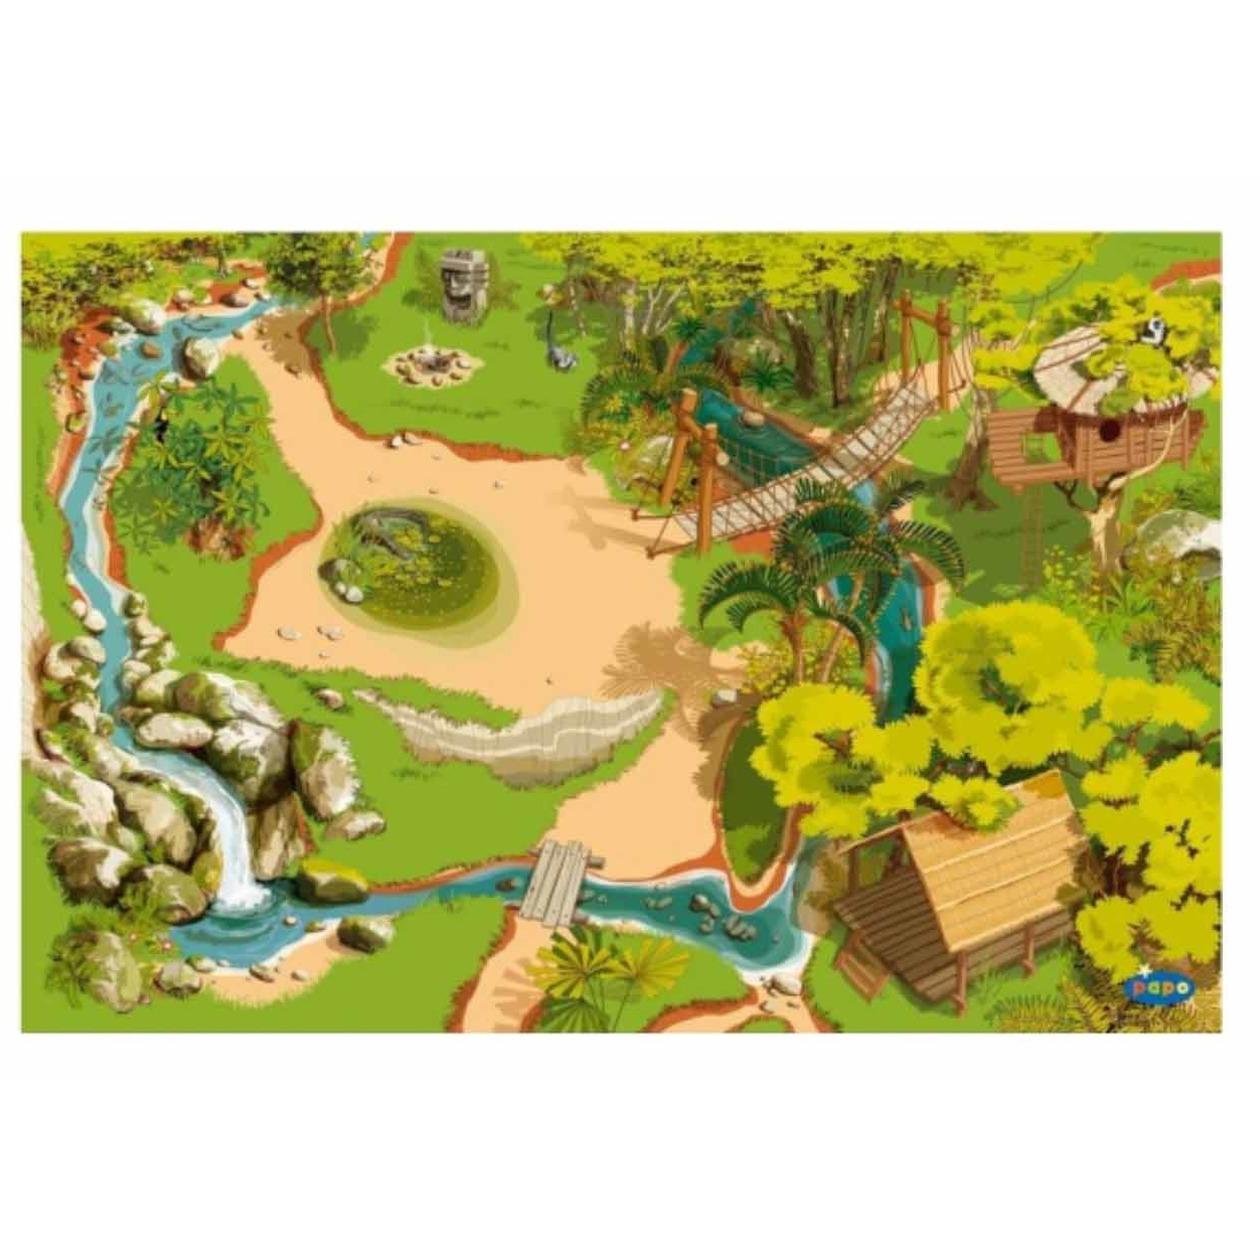 Jungle kleed 95 x 135 cm